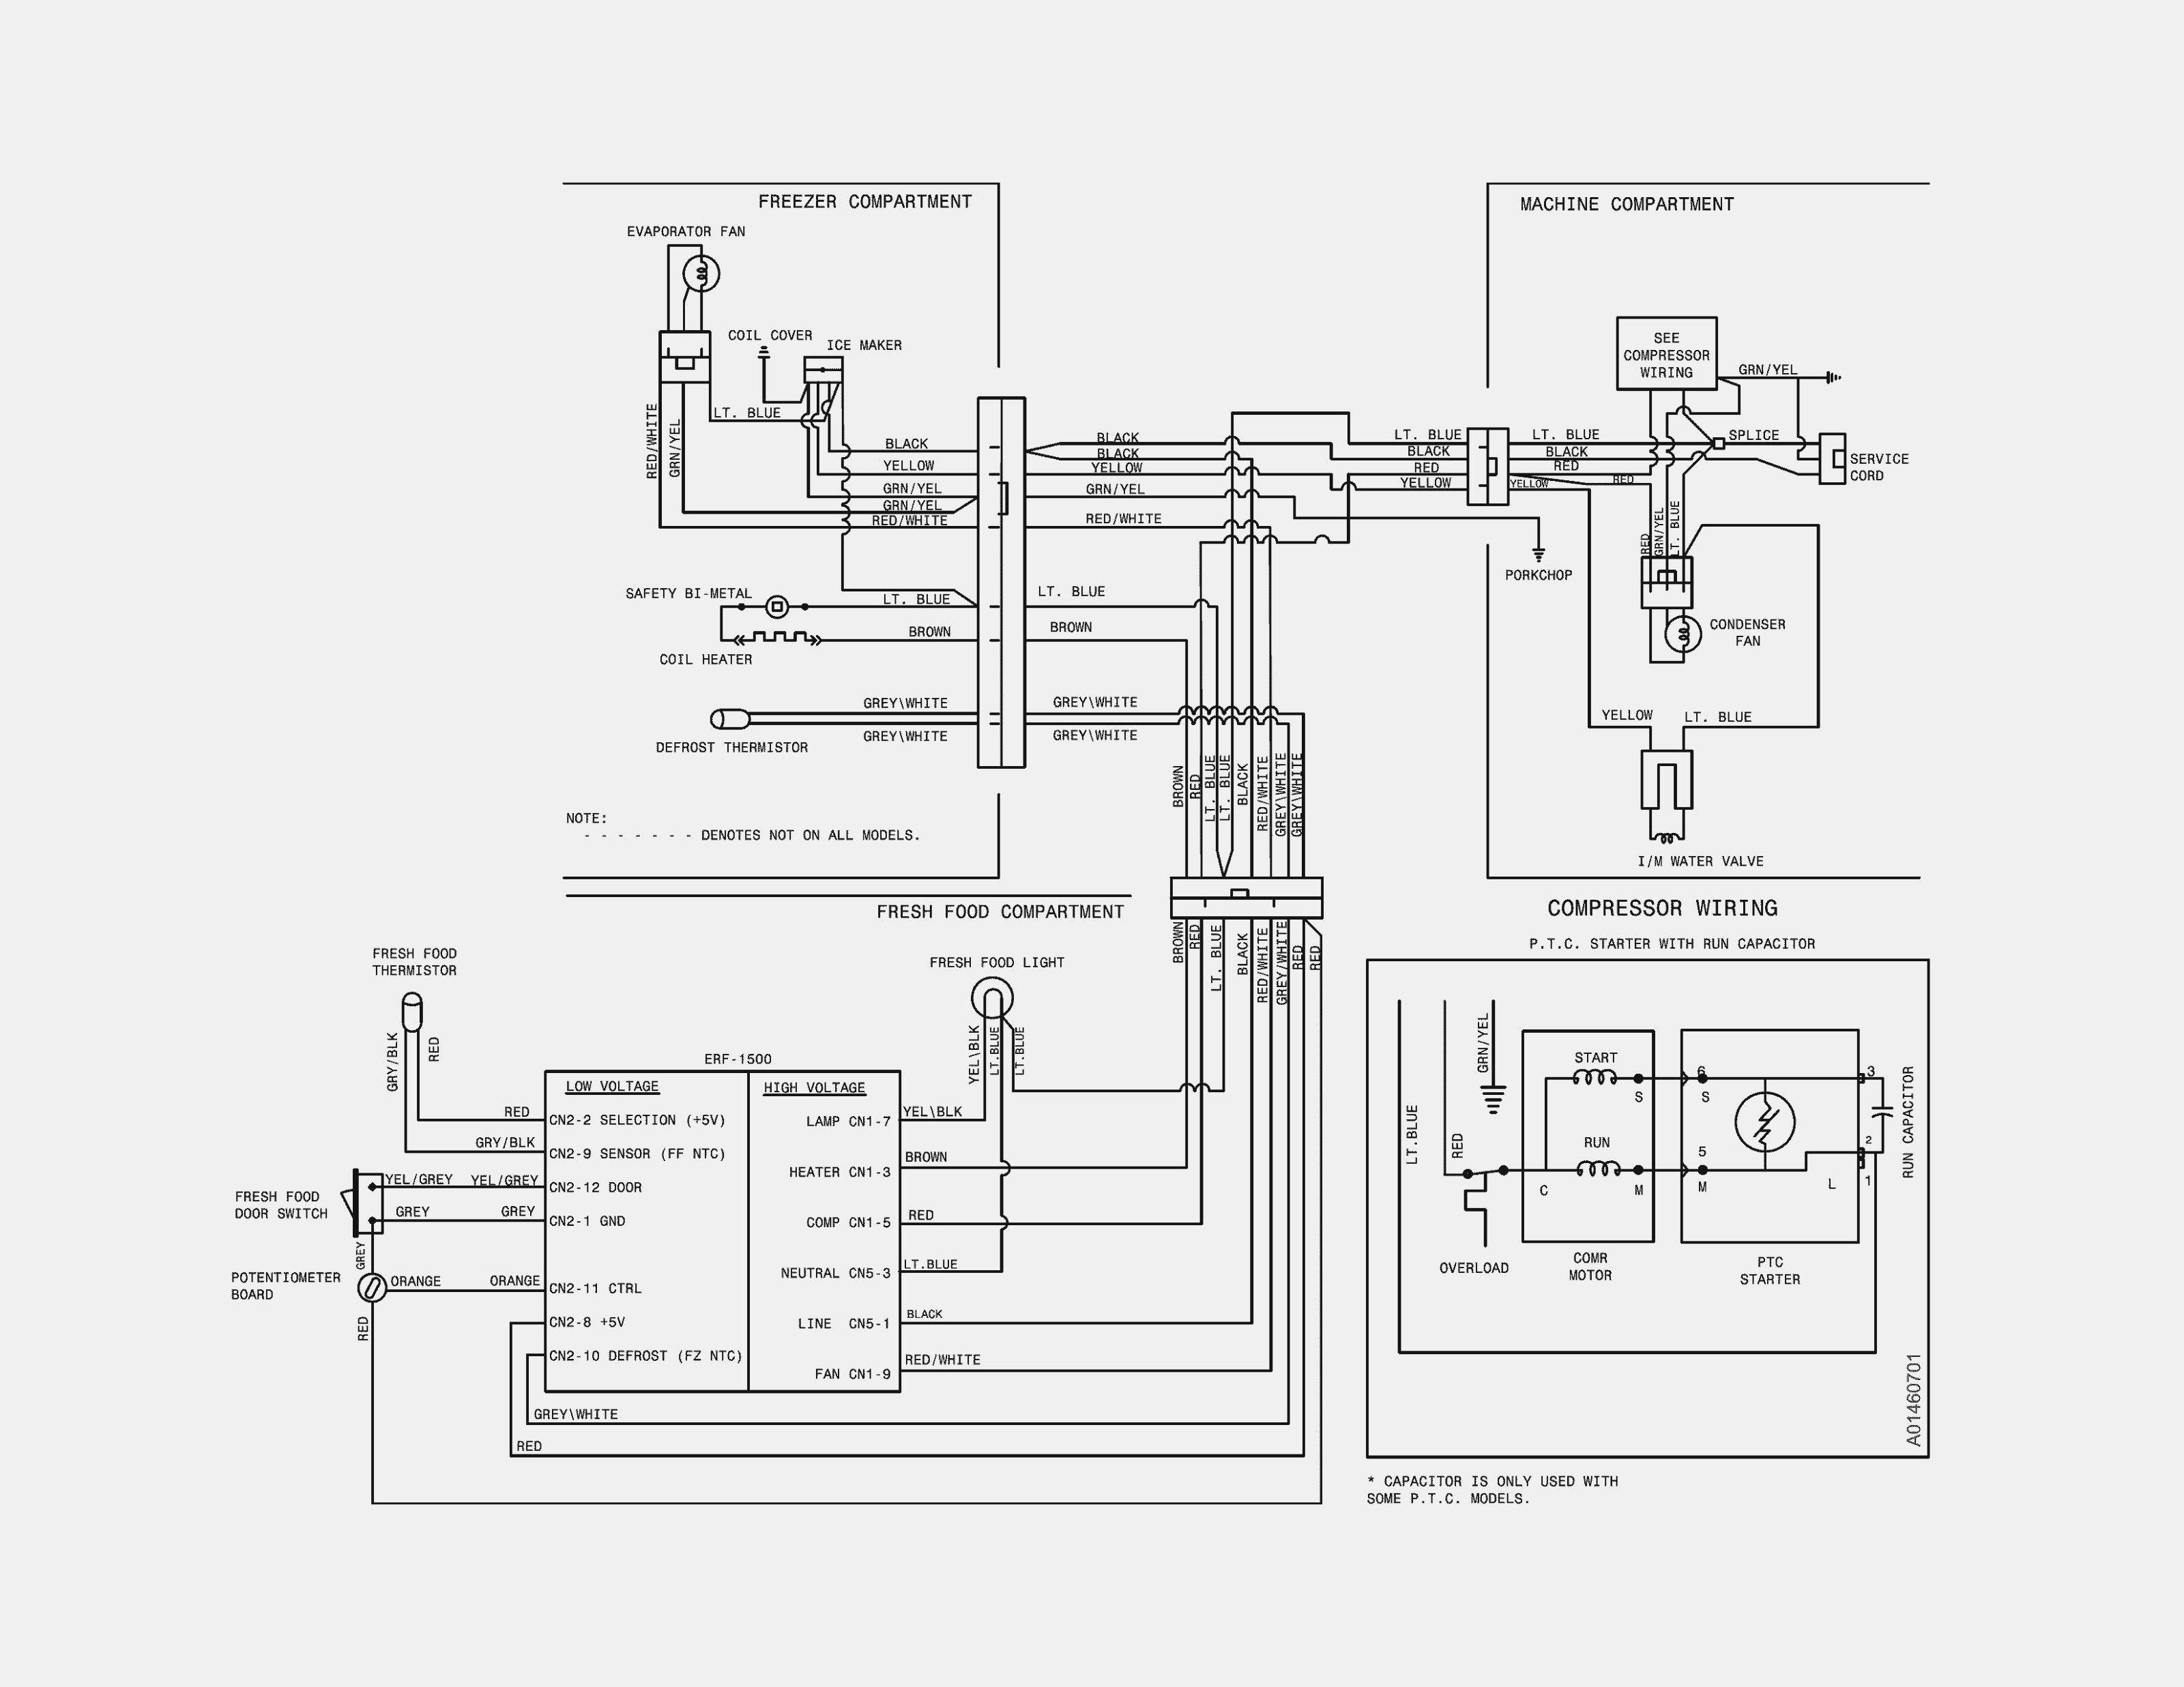 Wiring Diagram for Frigidaire Refrigerator Refrigerator Pressor Wiring Schematic Auto Electrical Wiring Of Wiring Diagram for Frigidaire Refrigerator